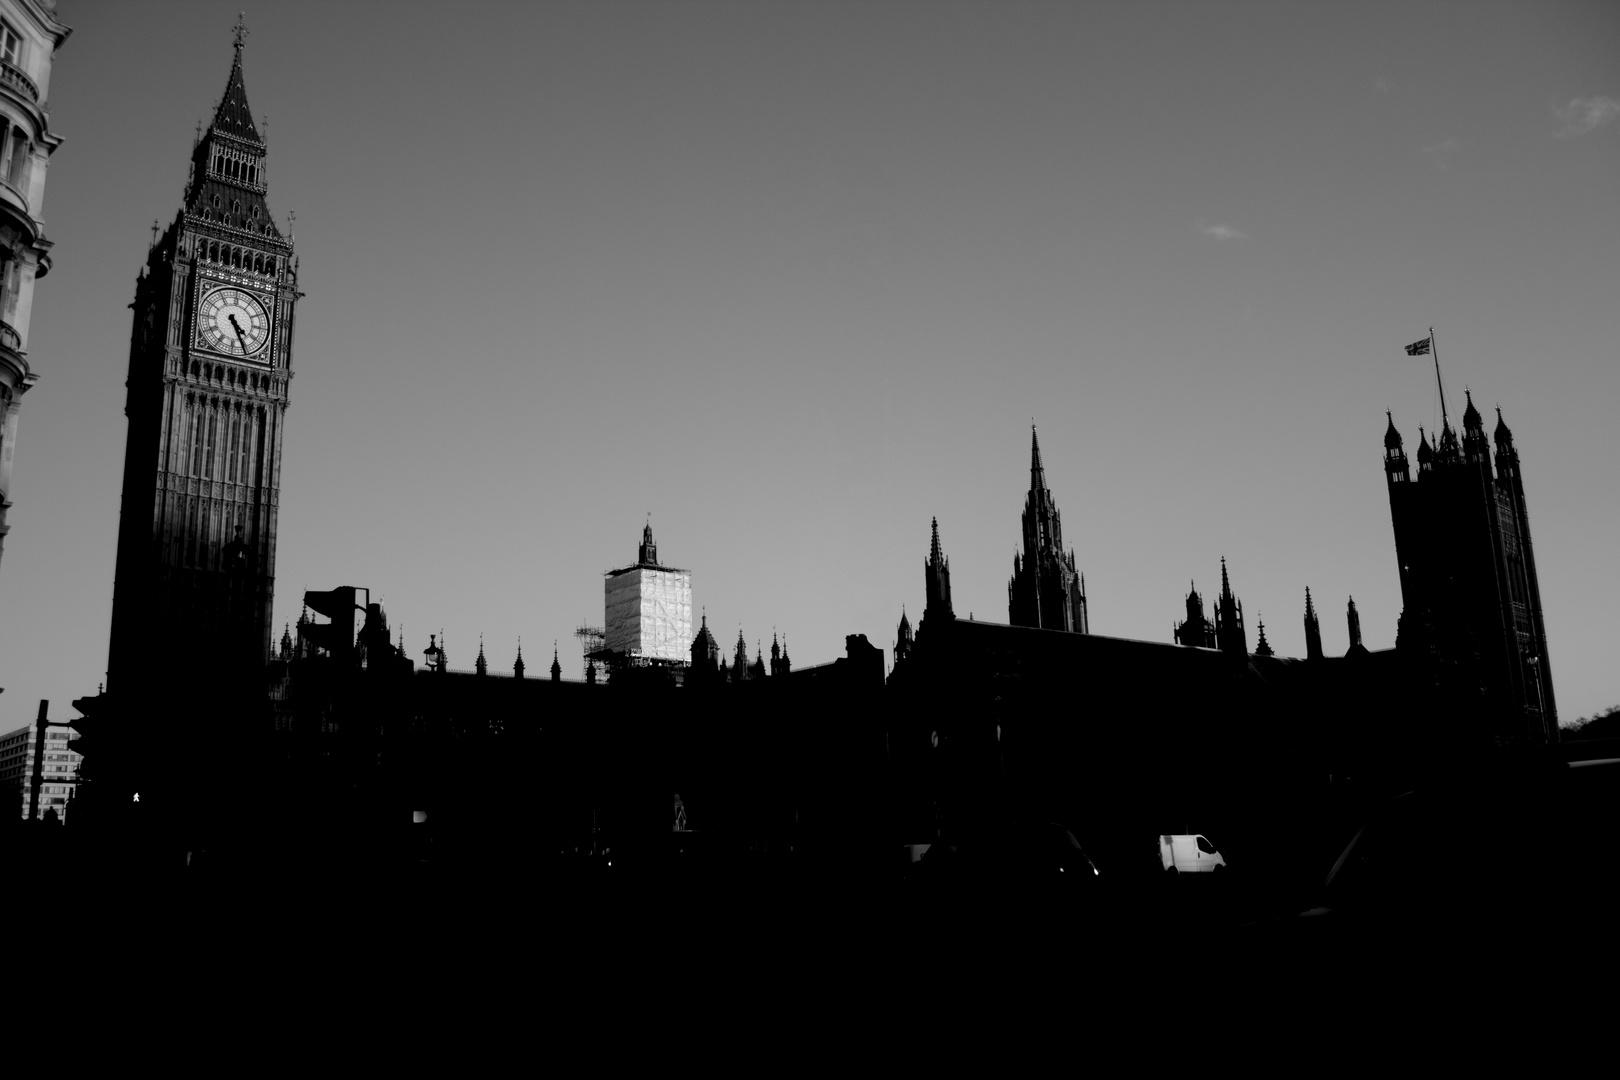 London Elizabeth Tower